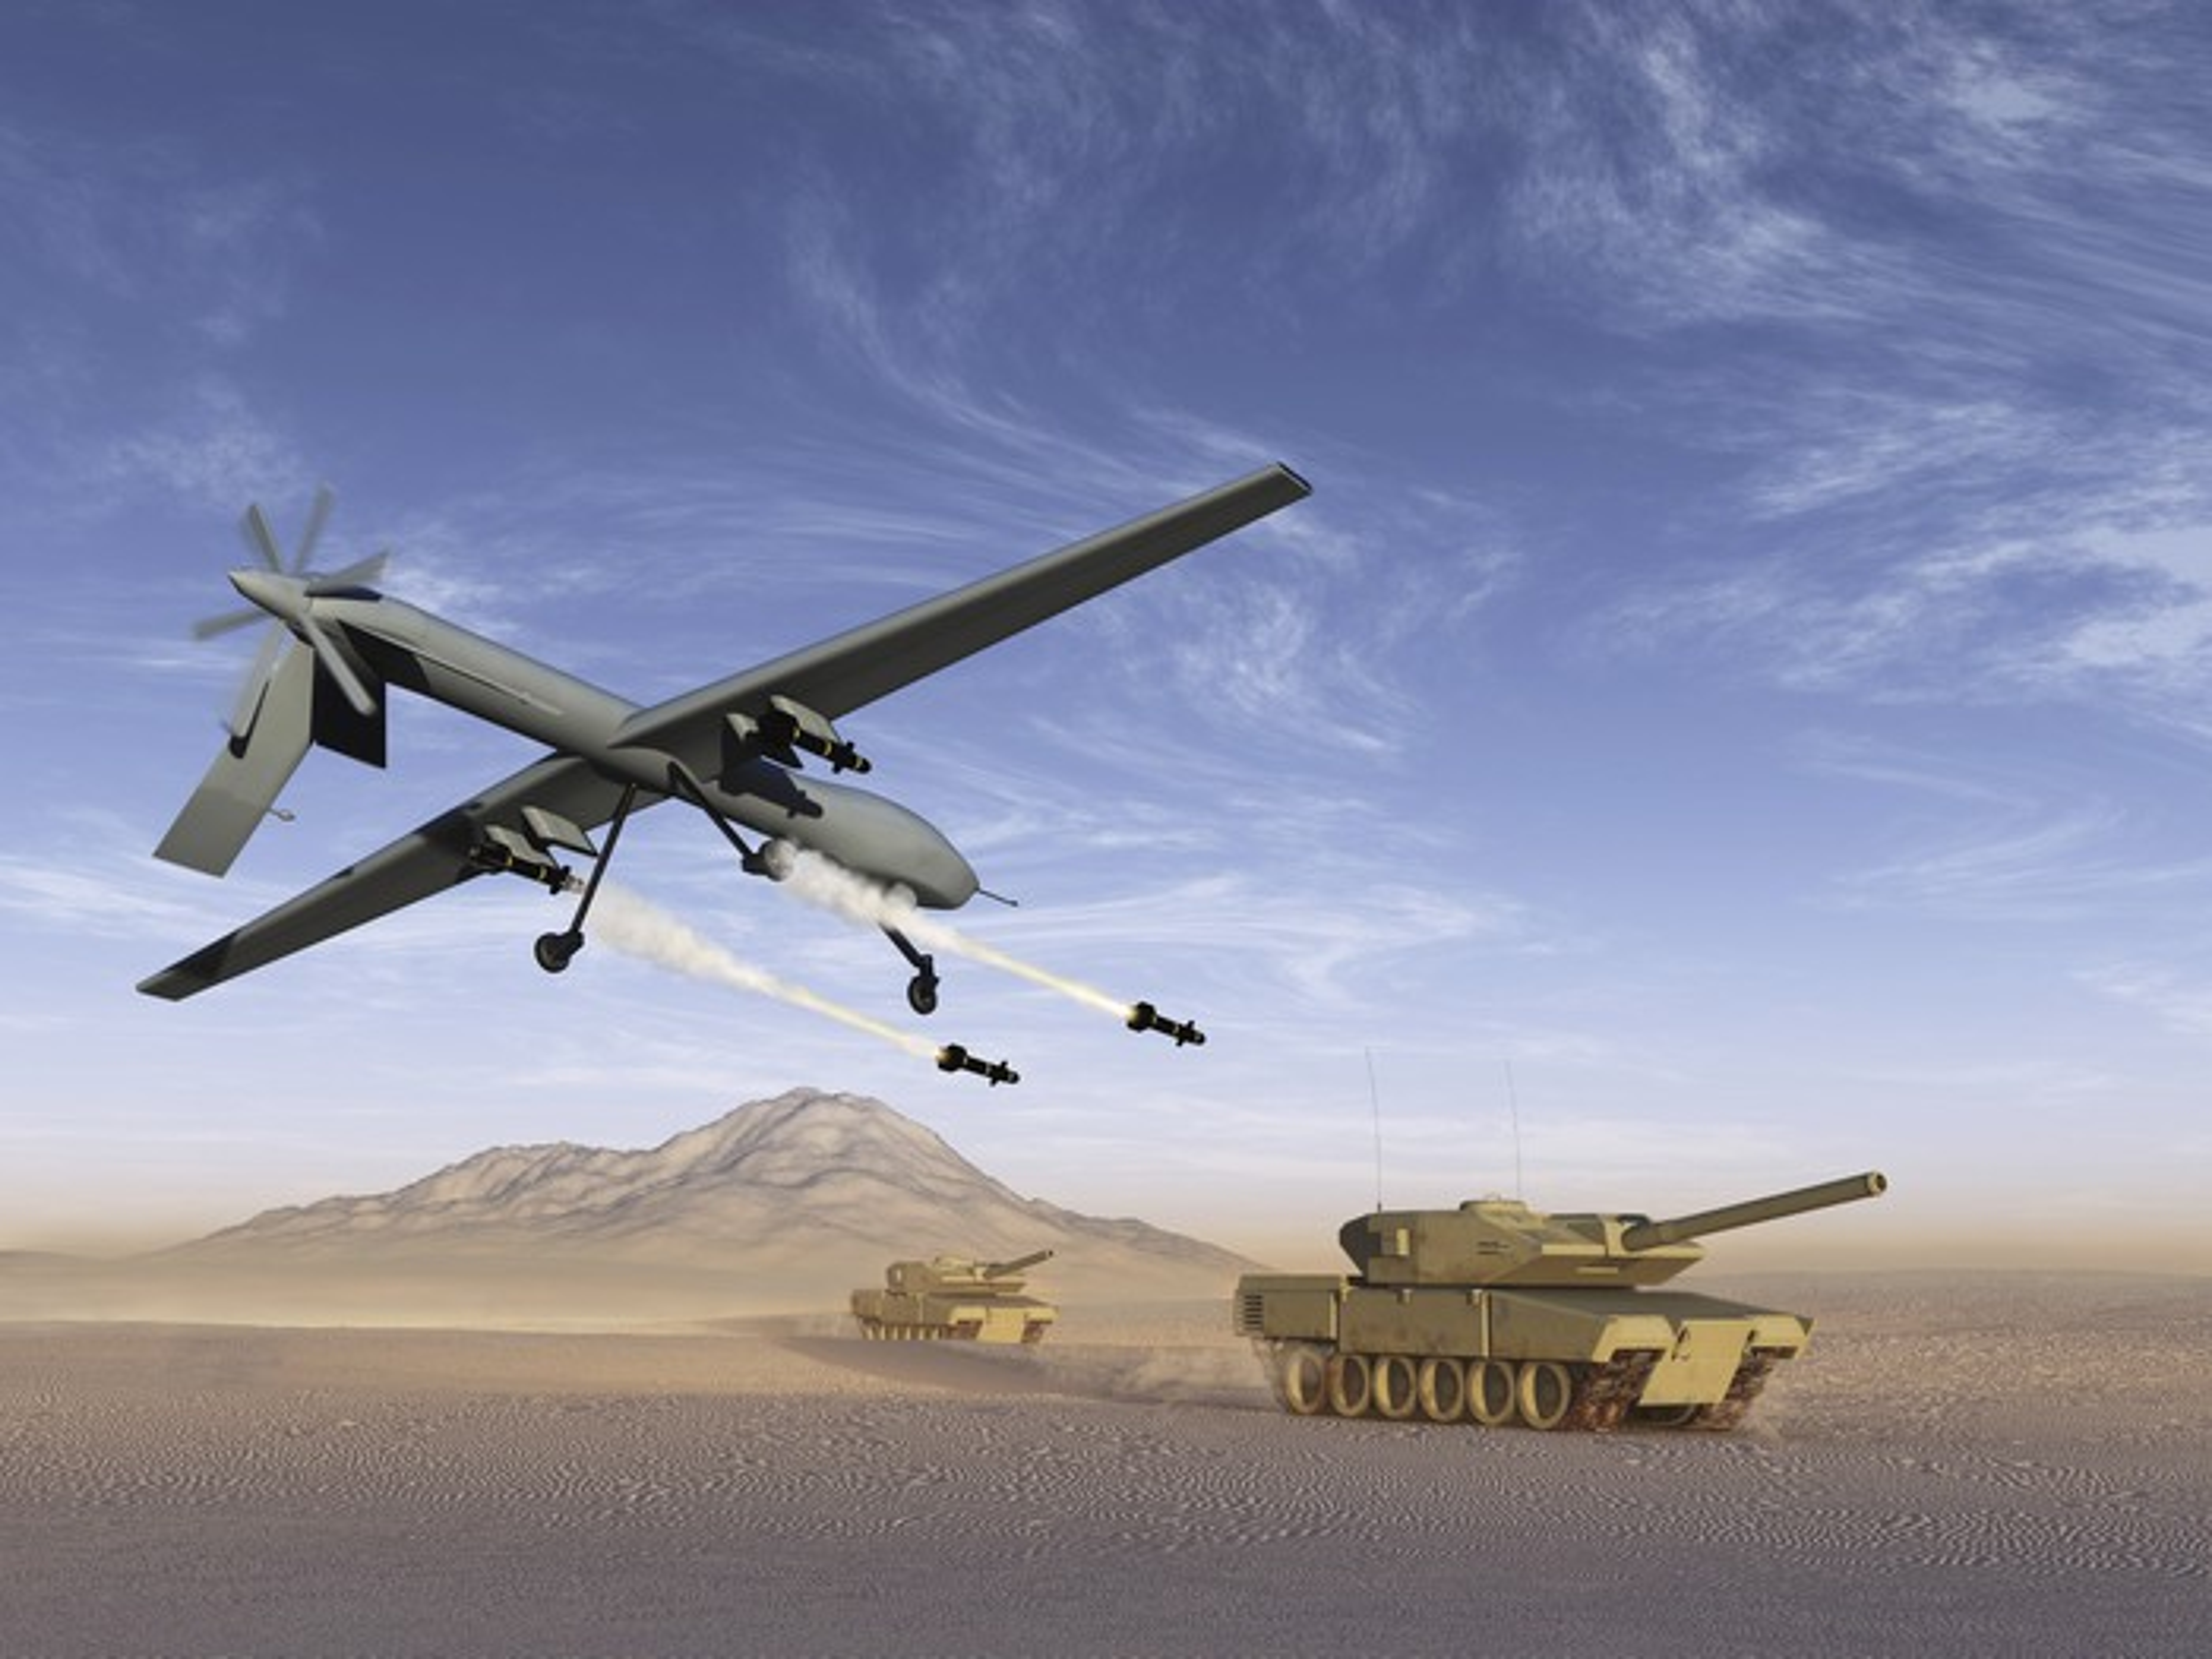 Drone firing at a tank